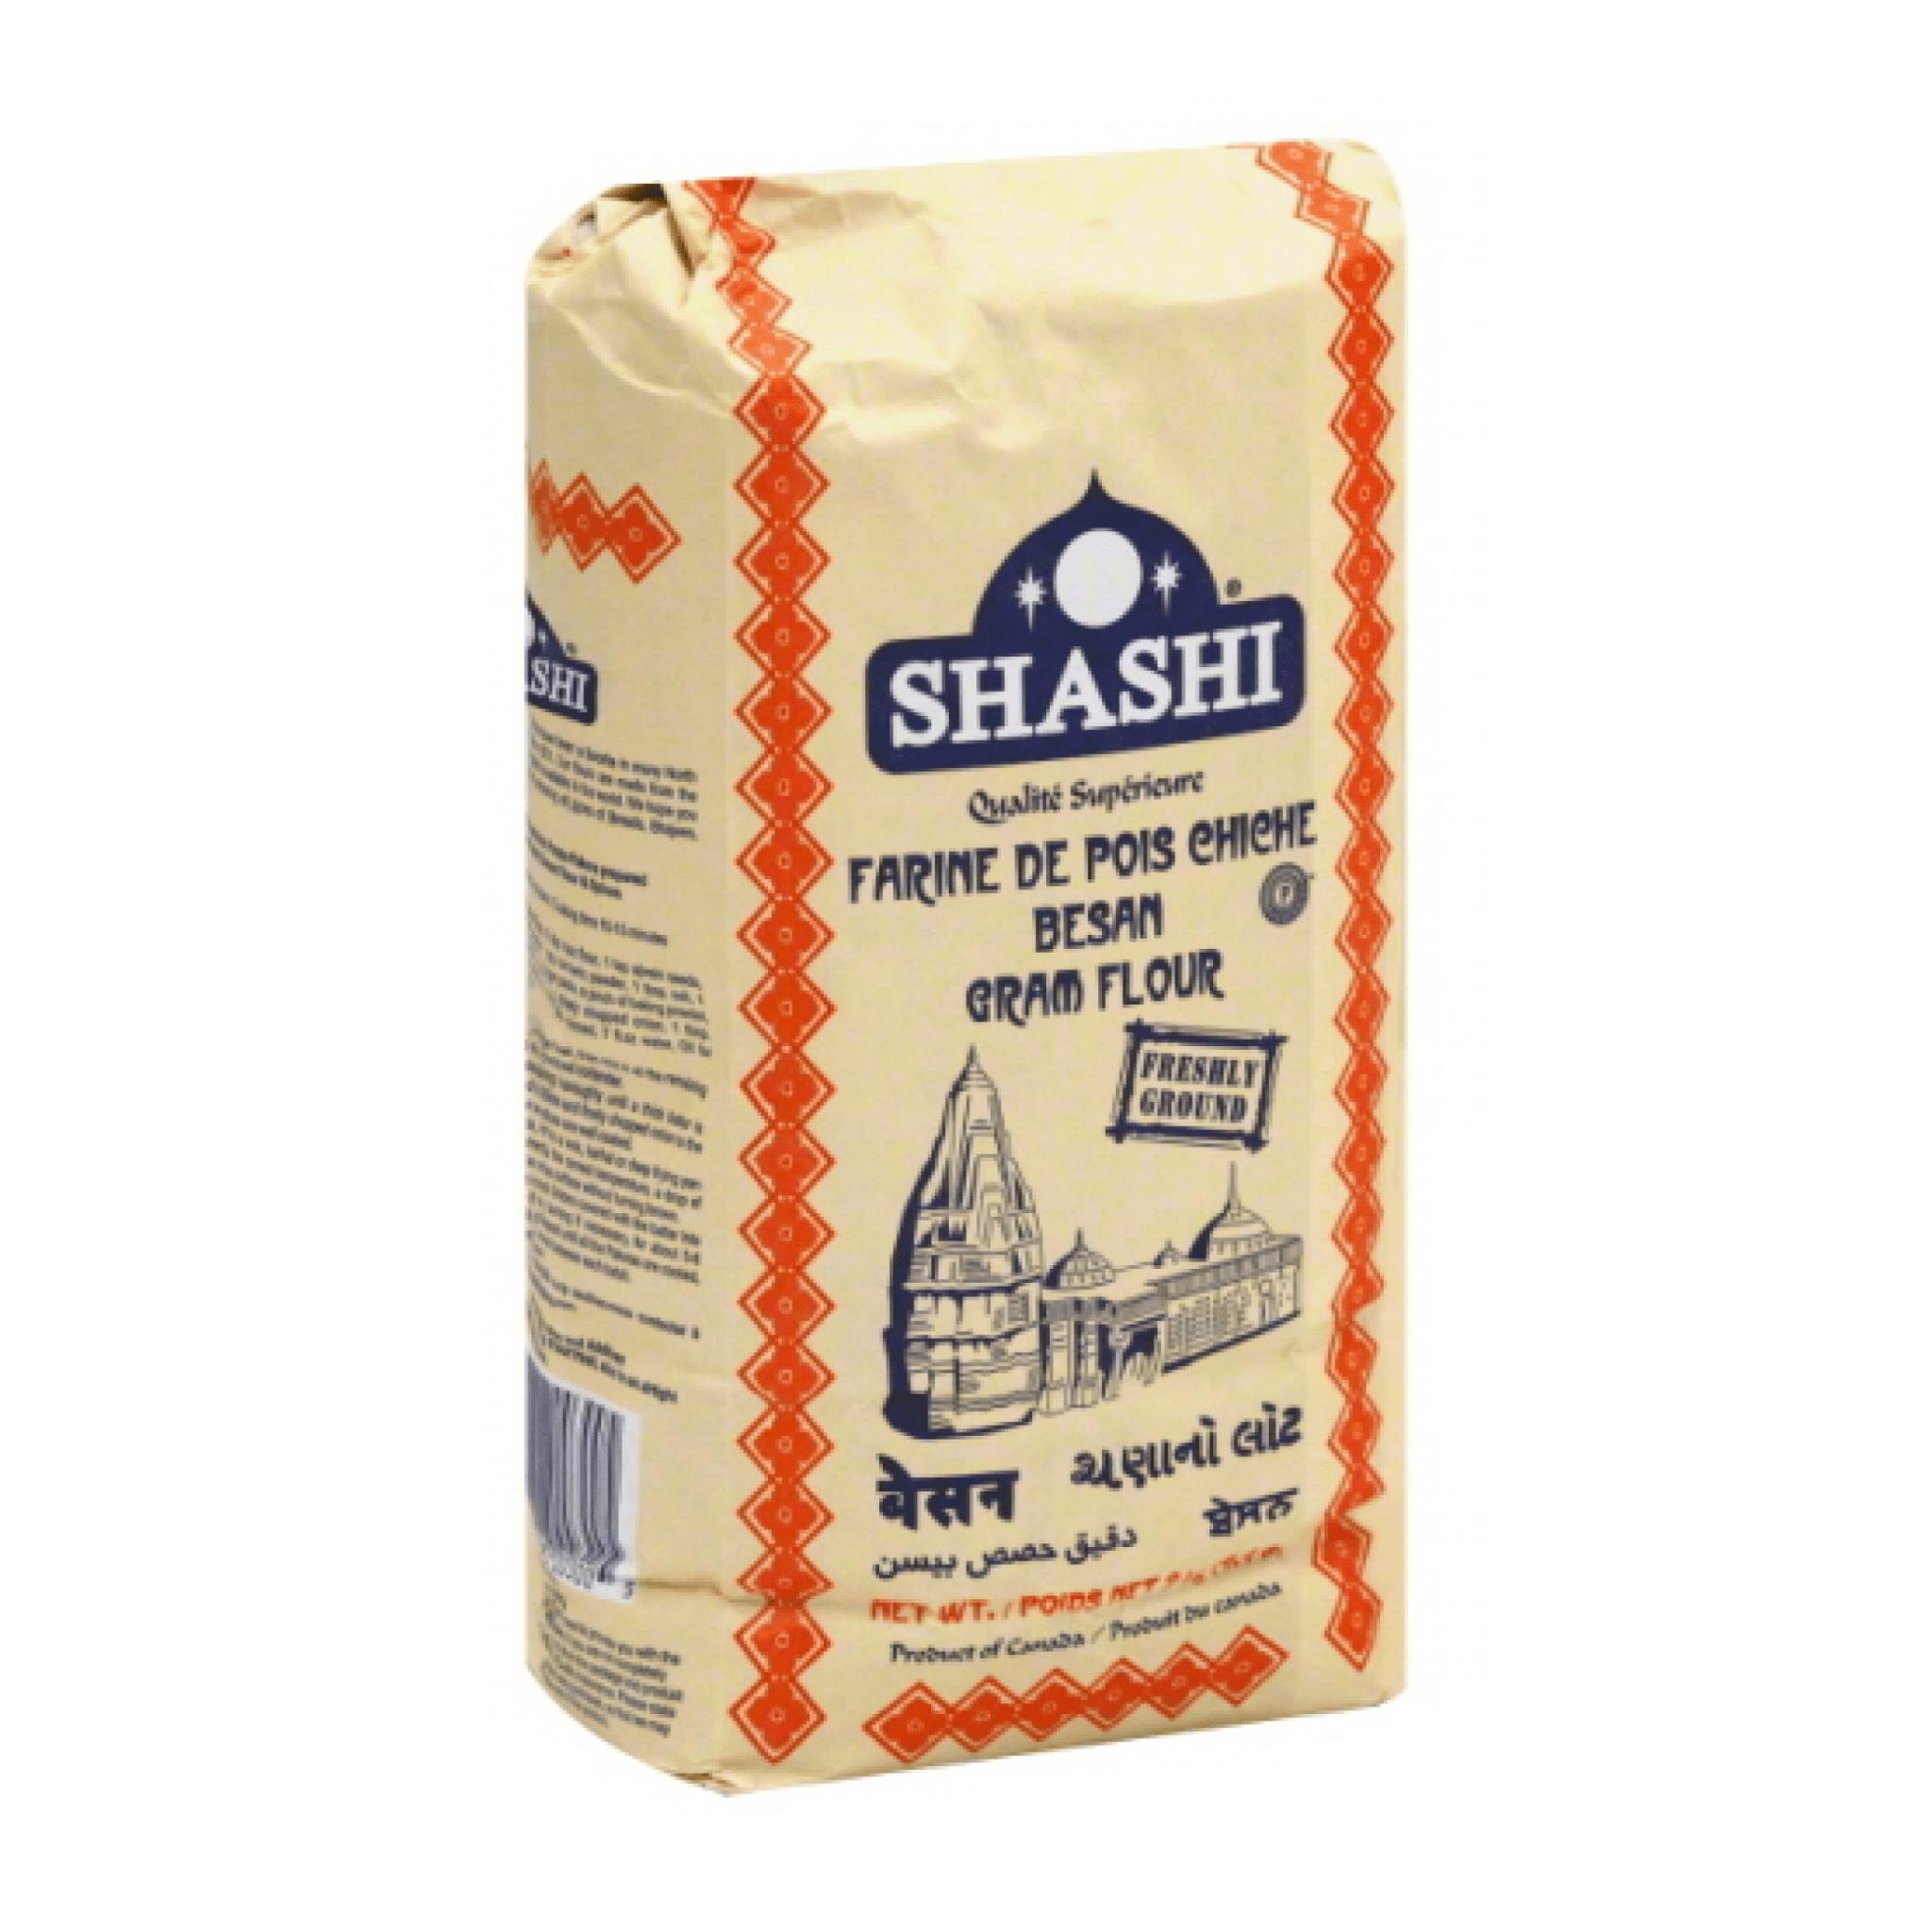 shashi farine de pois chiche 2kg la coop alimentaire. Black Bedroom Furniture Sets. Home Design Ideas